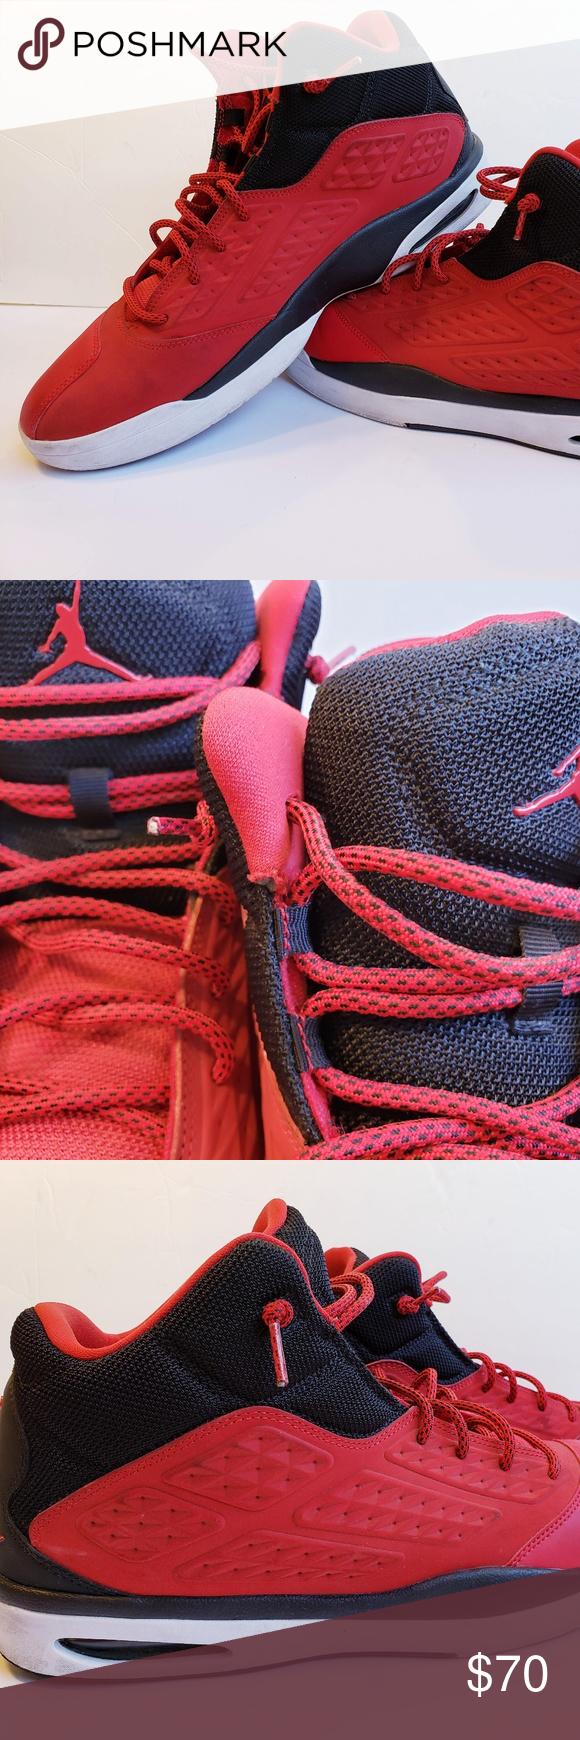 893239 Warm Gefütterte Damen Boots Outdoor Schuhe Stiefeletten Hiking New Look